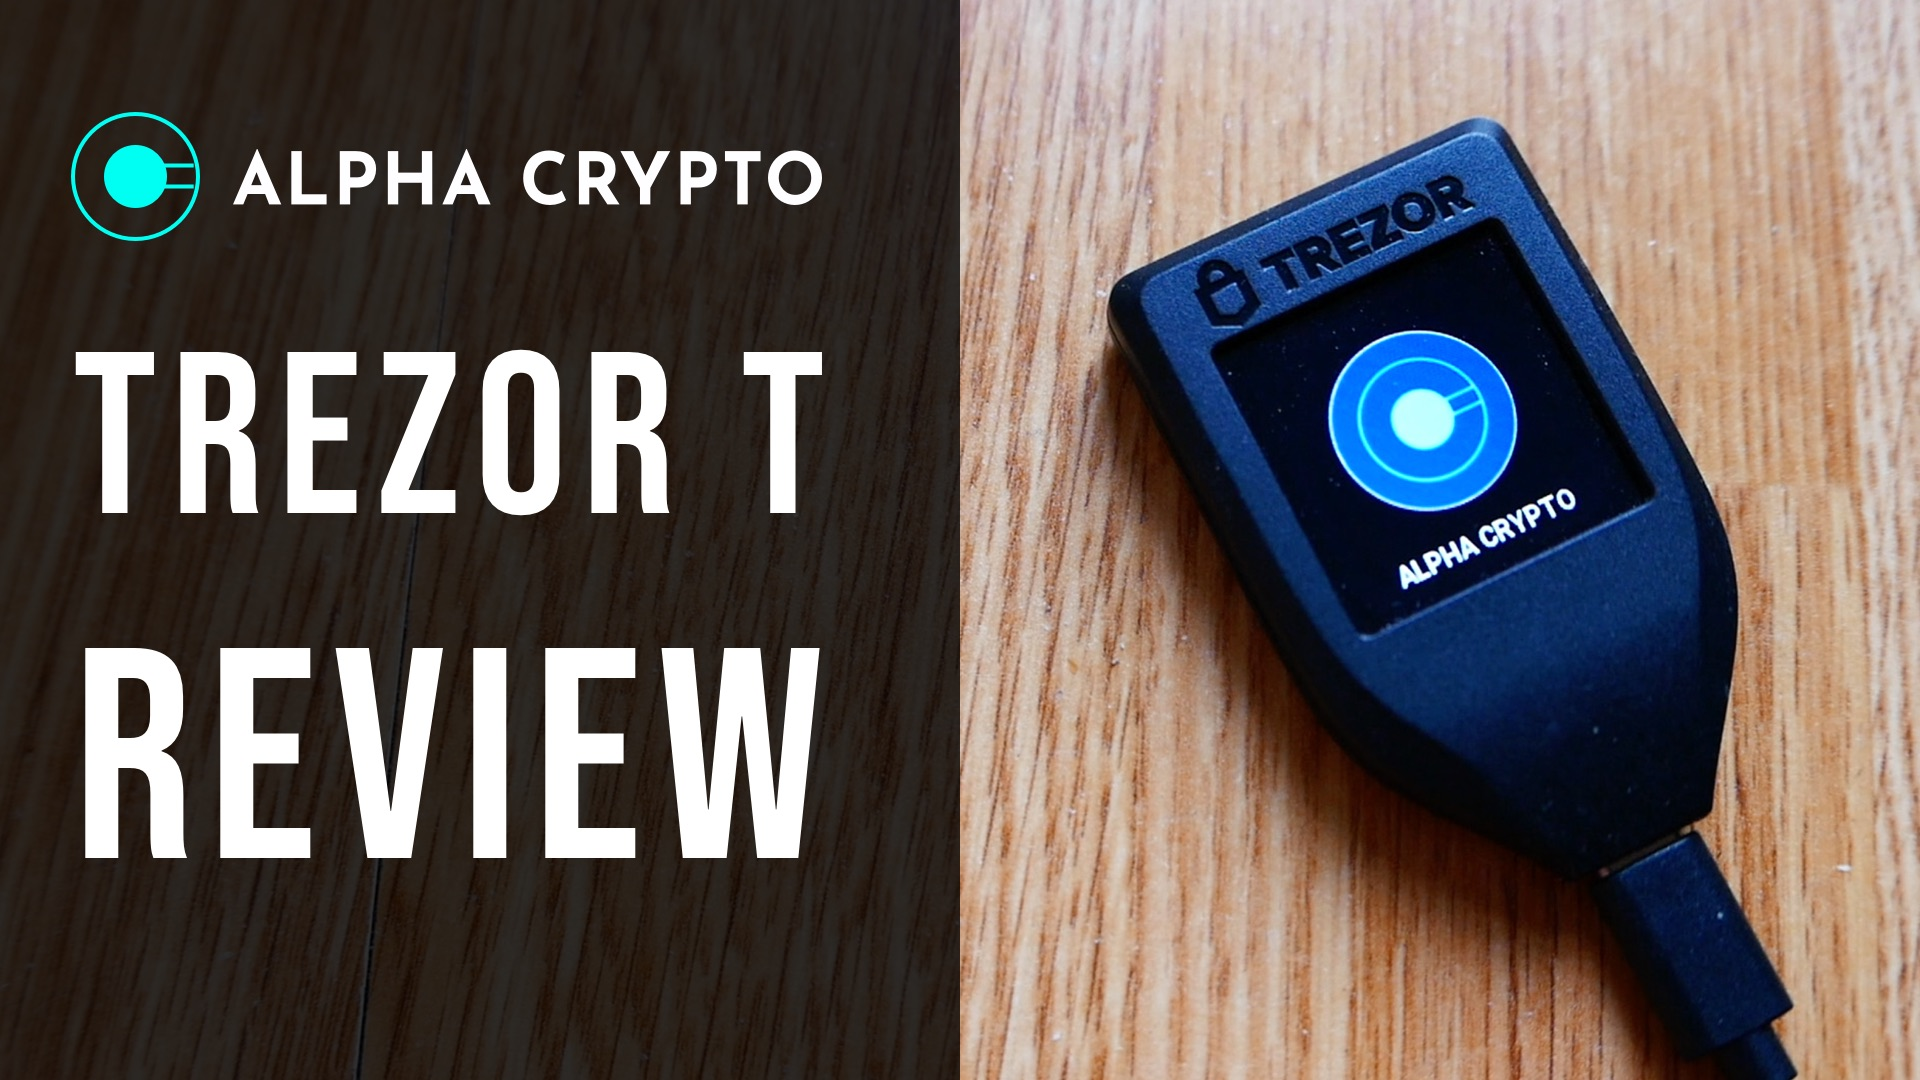 Trezor T review